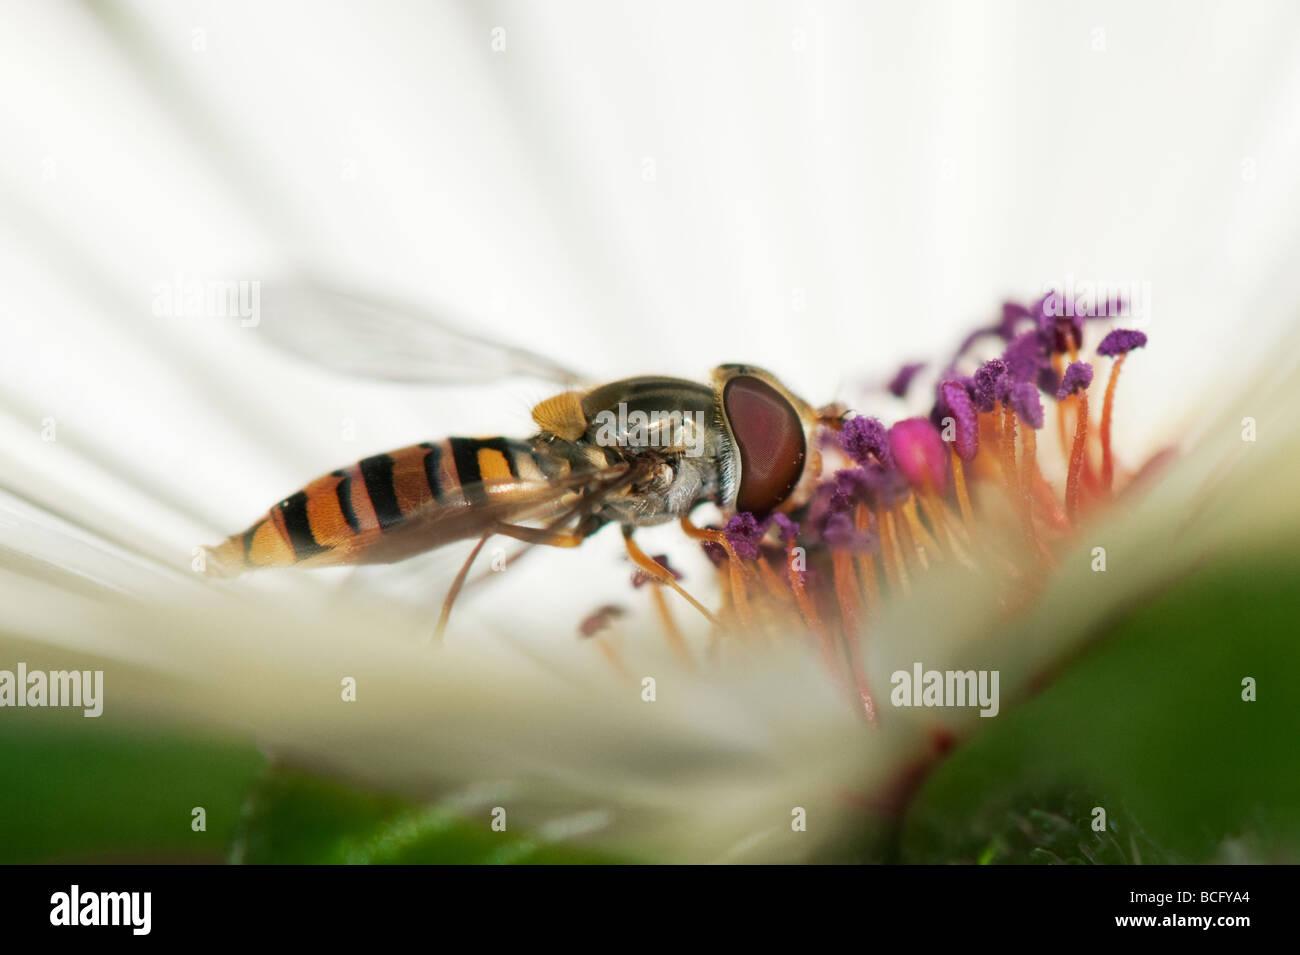 Hoverfly 'Syrphus torvus' feeding on Livinstone daisy flower - Stock Image